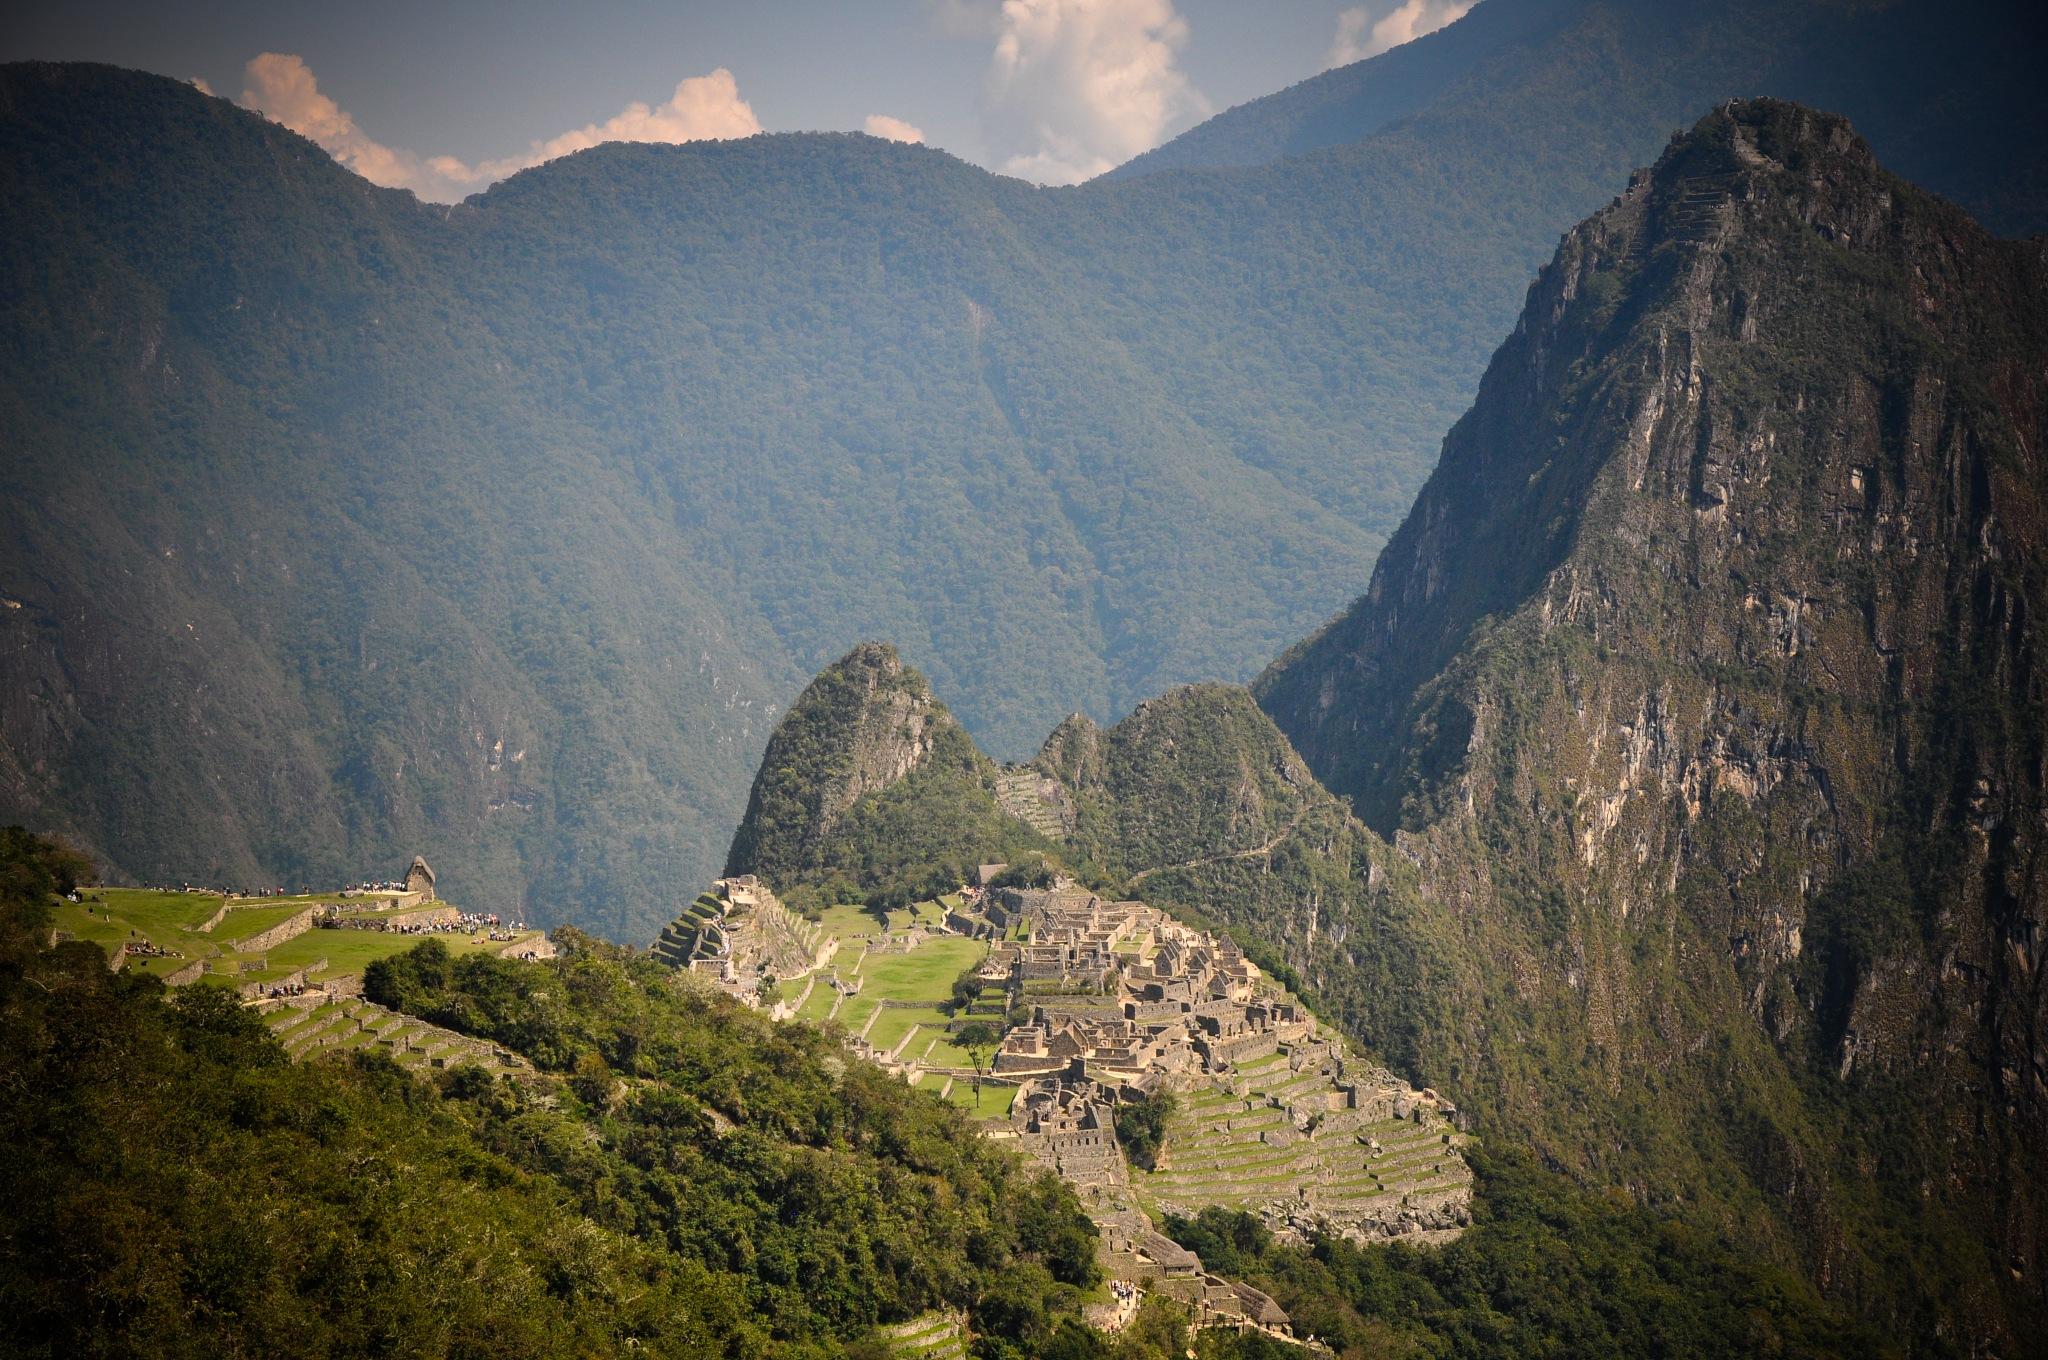 Machu Picchu, Built Around 1450 (Peru) by Jiri Bielicky